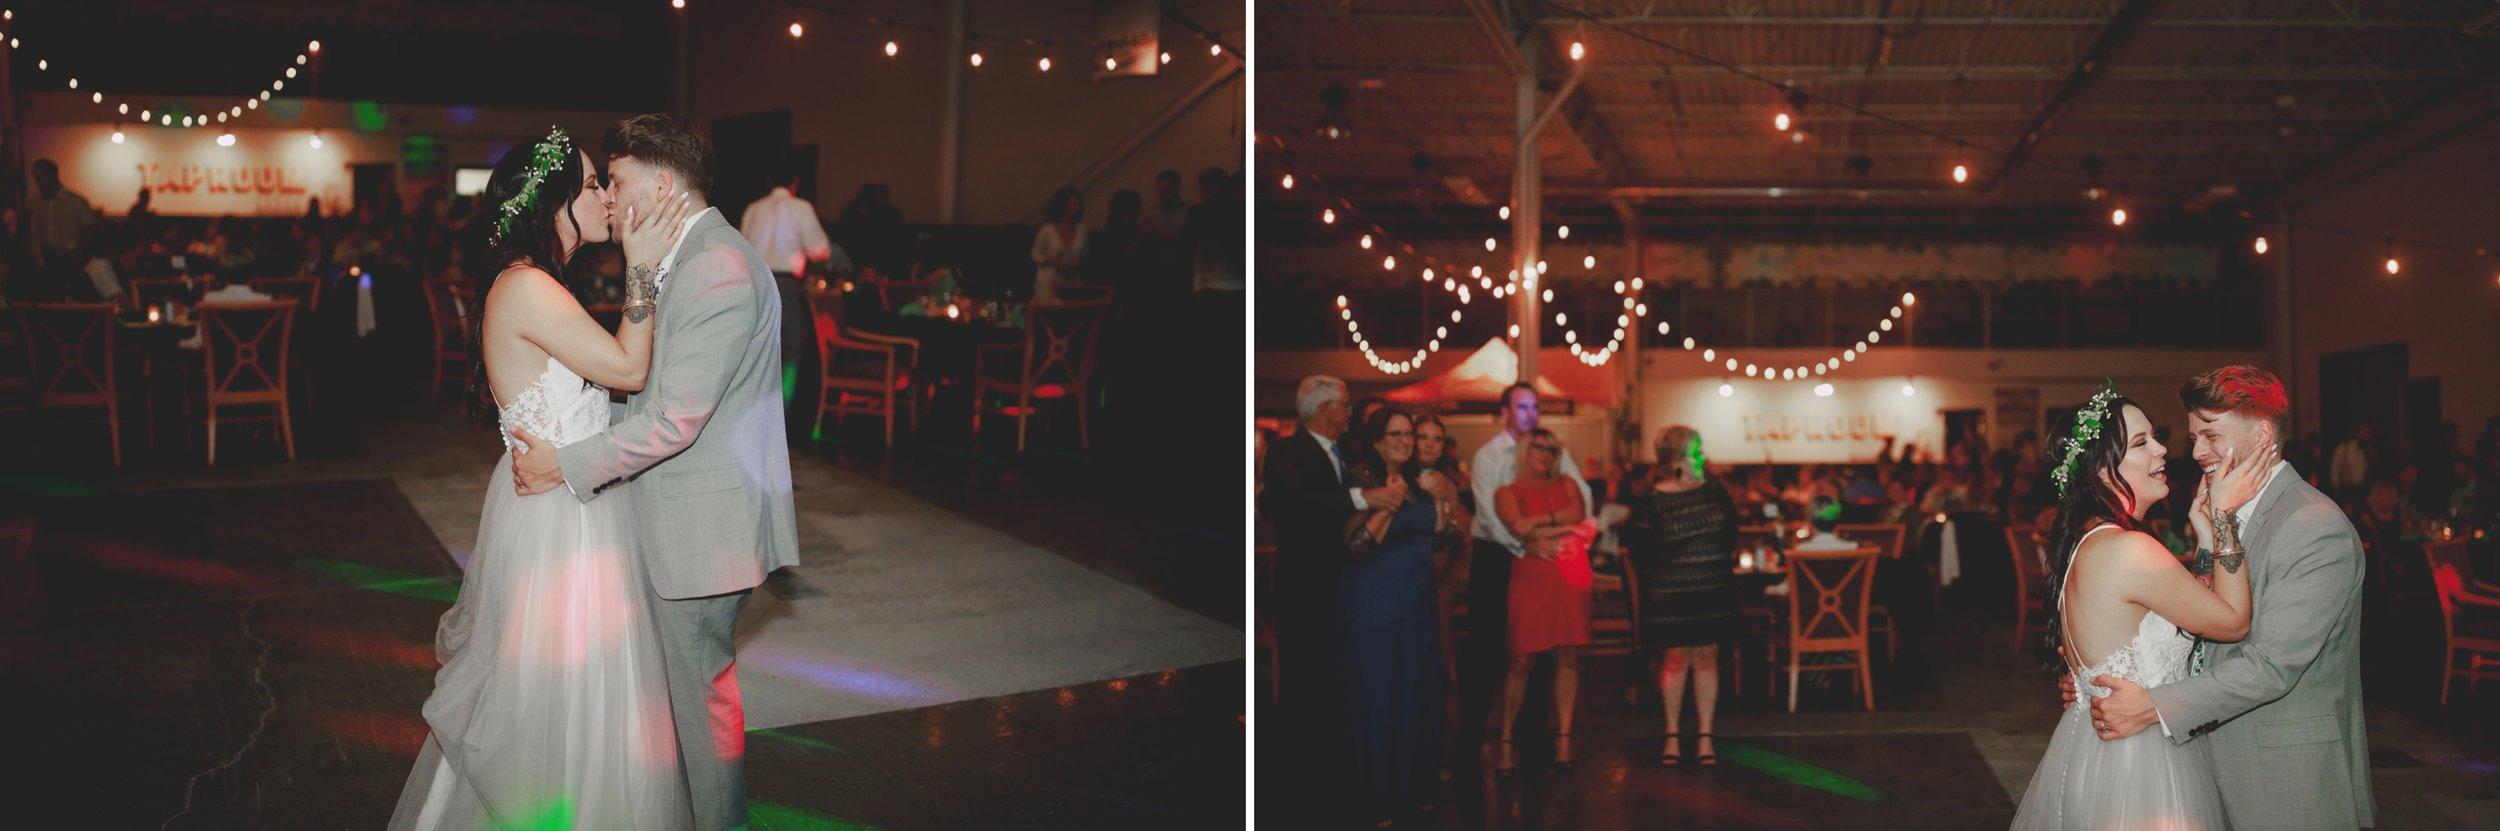 amanda_vanvels_michigan_camp_wedding_170.jpg